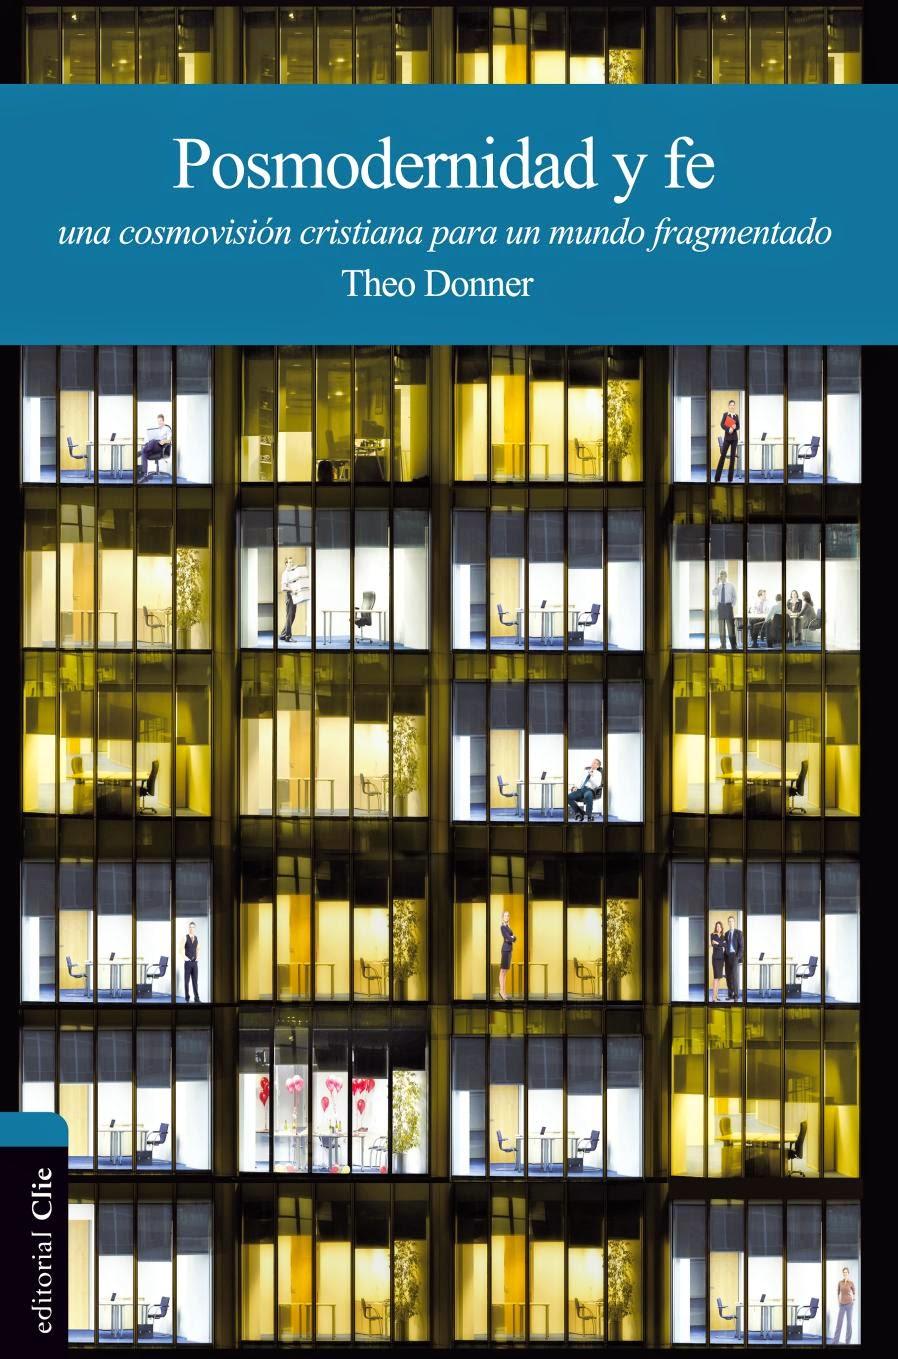 Theo Donner-Posmodernidad y Fe-